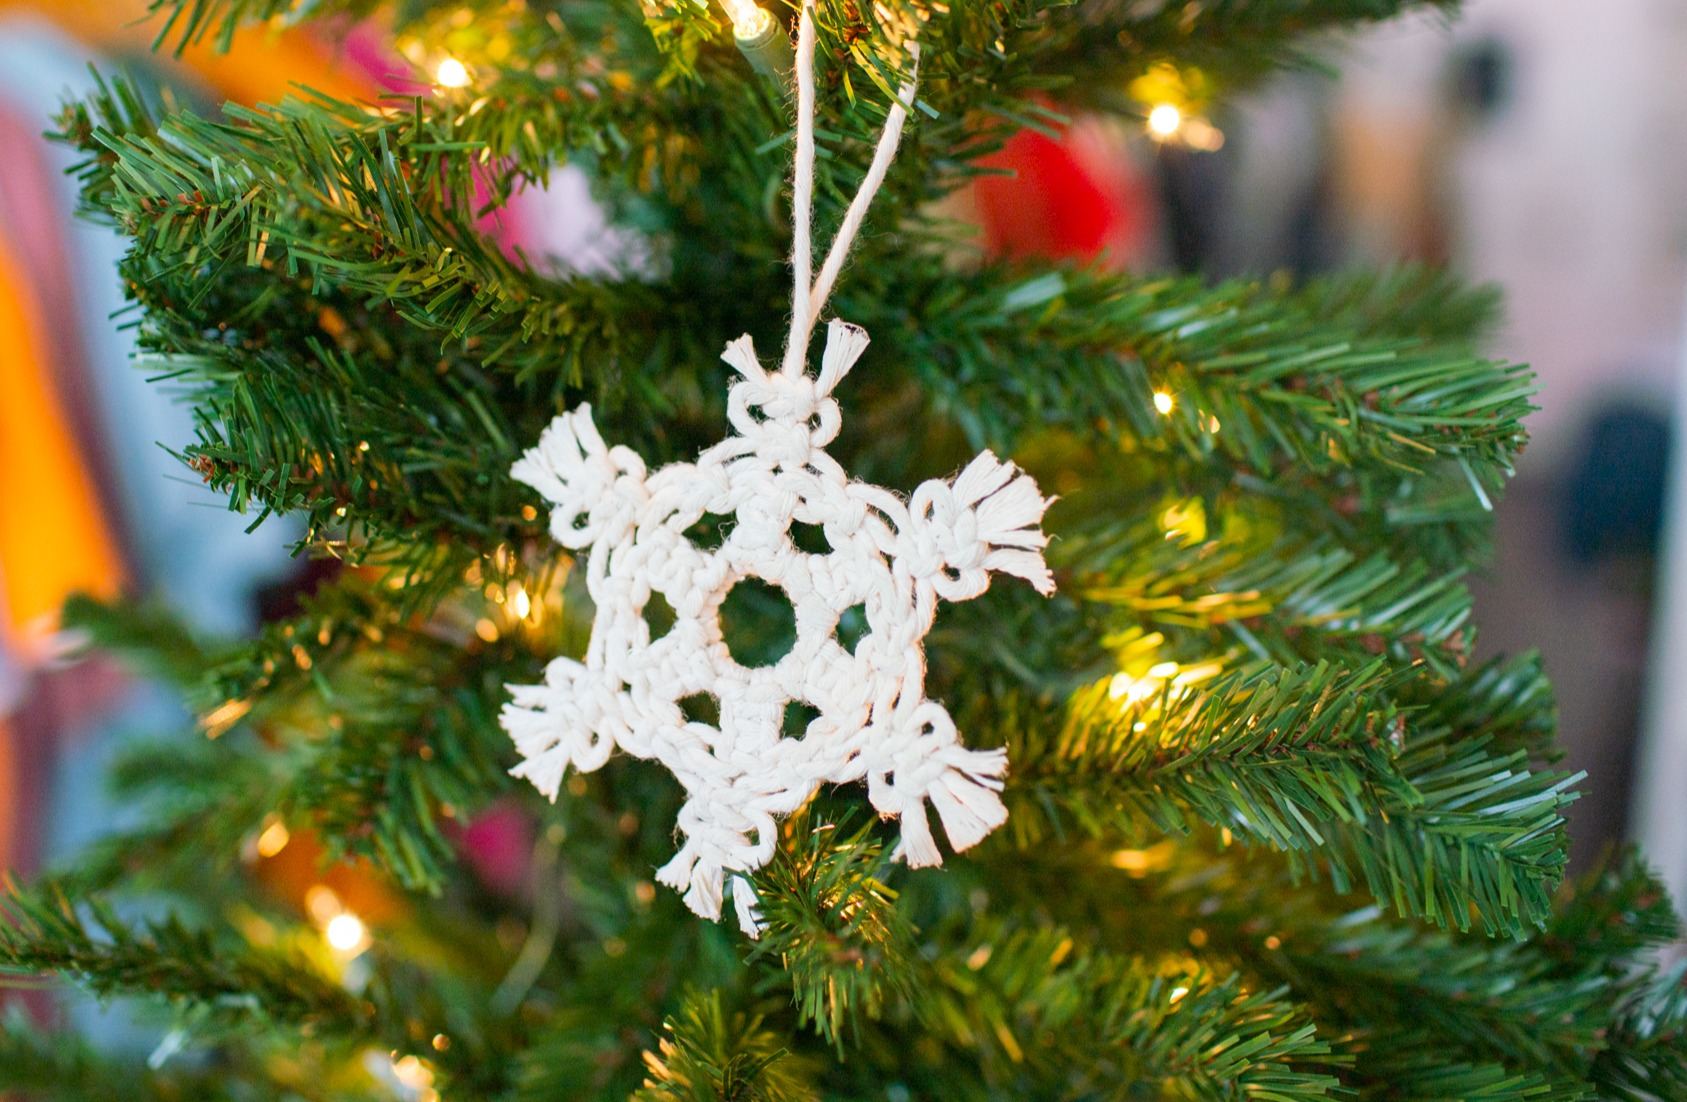 Make A Macrame Snowflake Ornament Step By Step Diy Tutorial Jenny Lemons